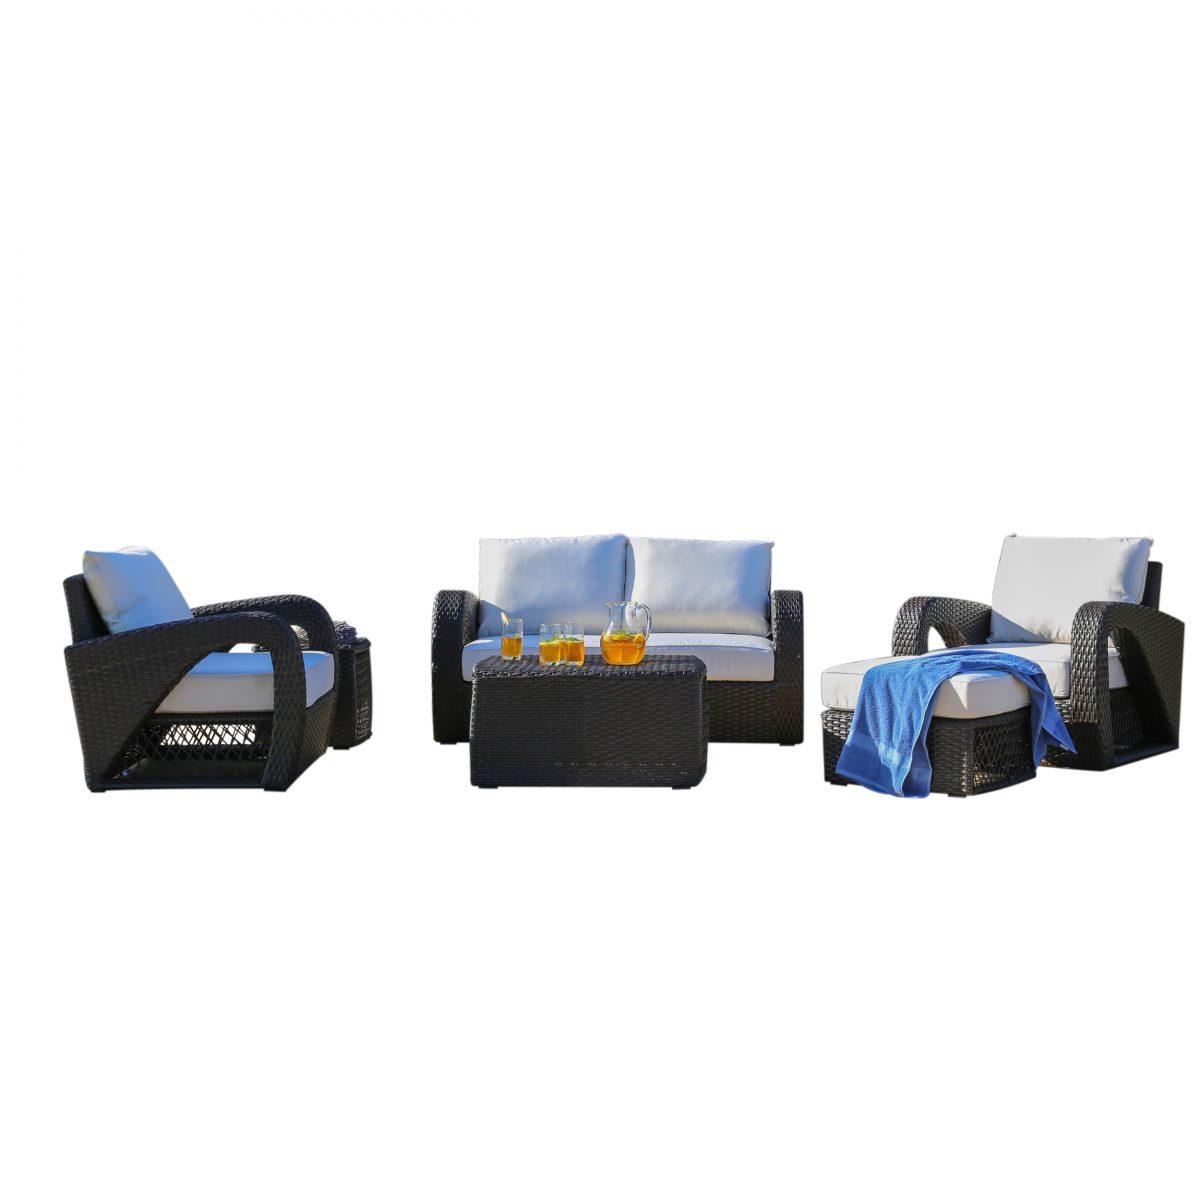 Sirio Settina 6 Piece Resin Wicker And Sunbrella Outdoor Furniture